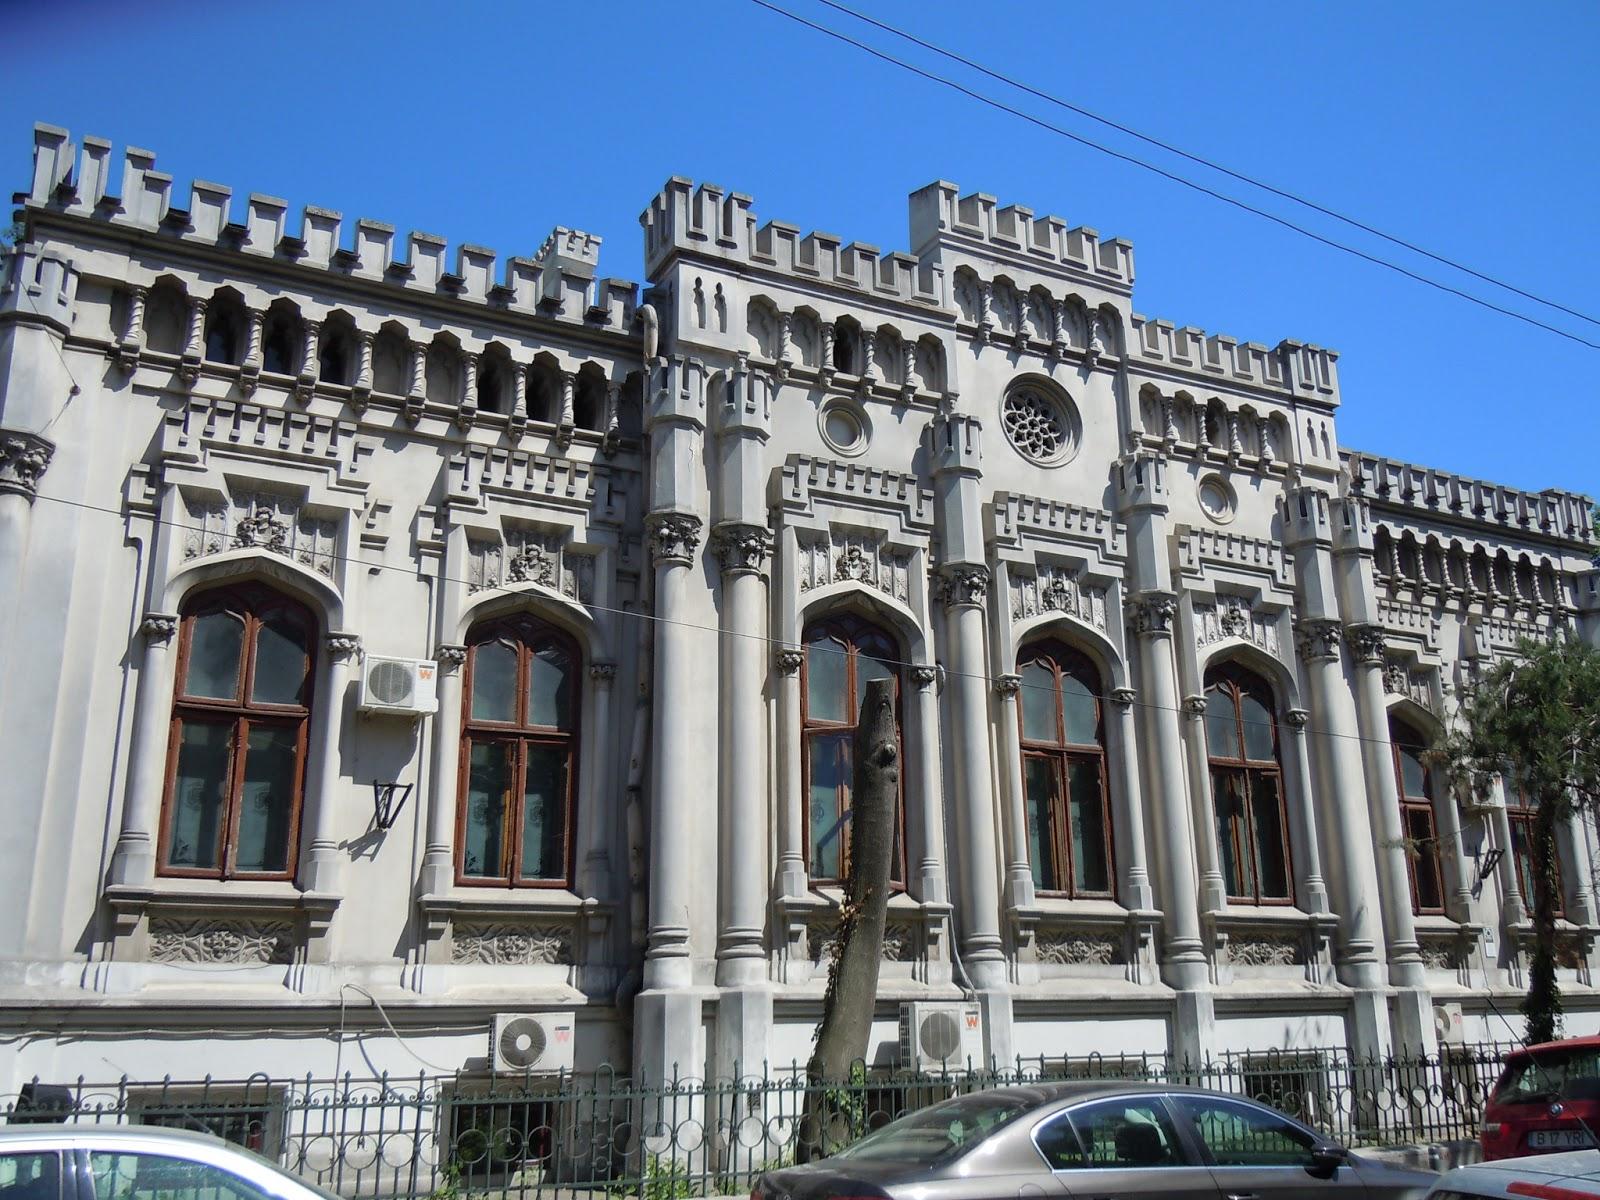 la pas prin Bucuresti - intre Piata Romana si Strada Arthur Verona